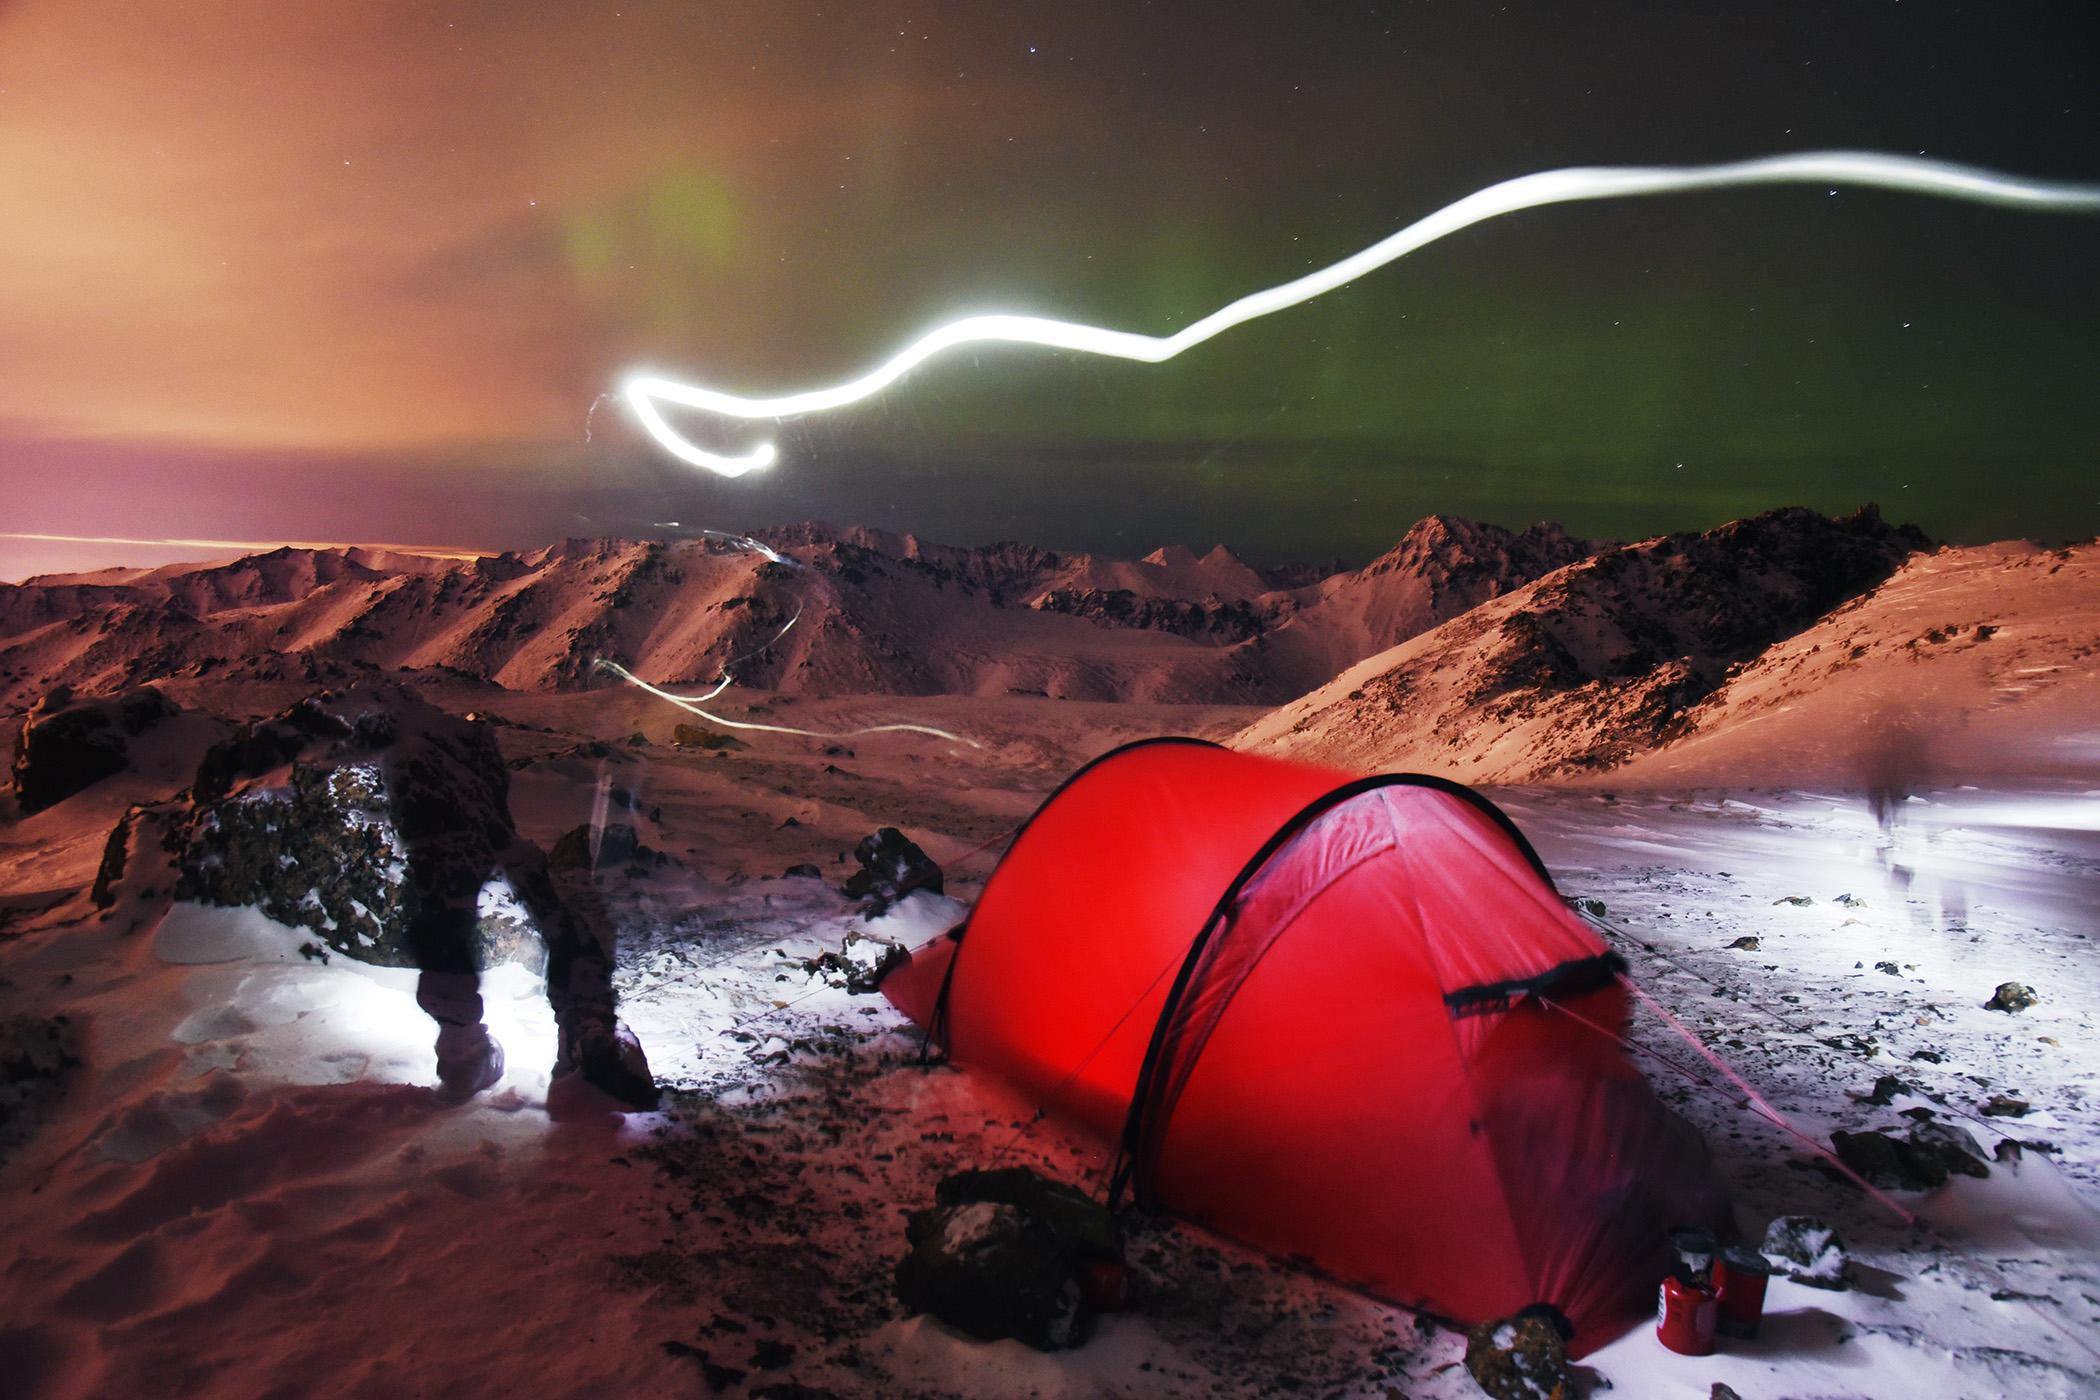 Hilleberg Nammatj 2 tent on the summit of McHugh Peak & Hilleberg Nammatj 2 tent review | Winterbear.com product reviews